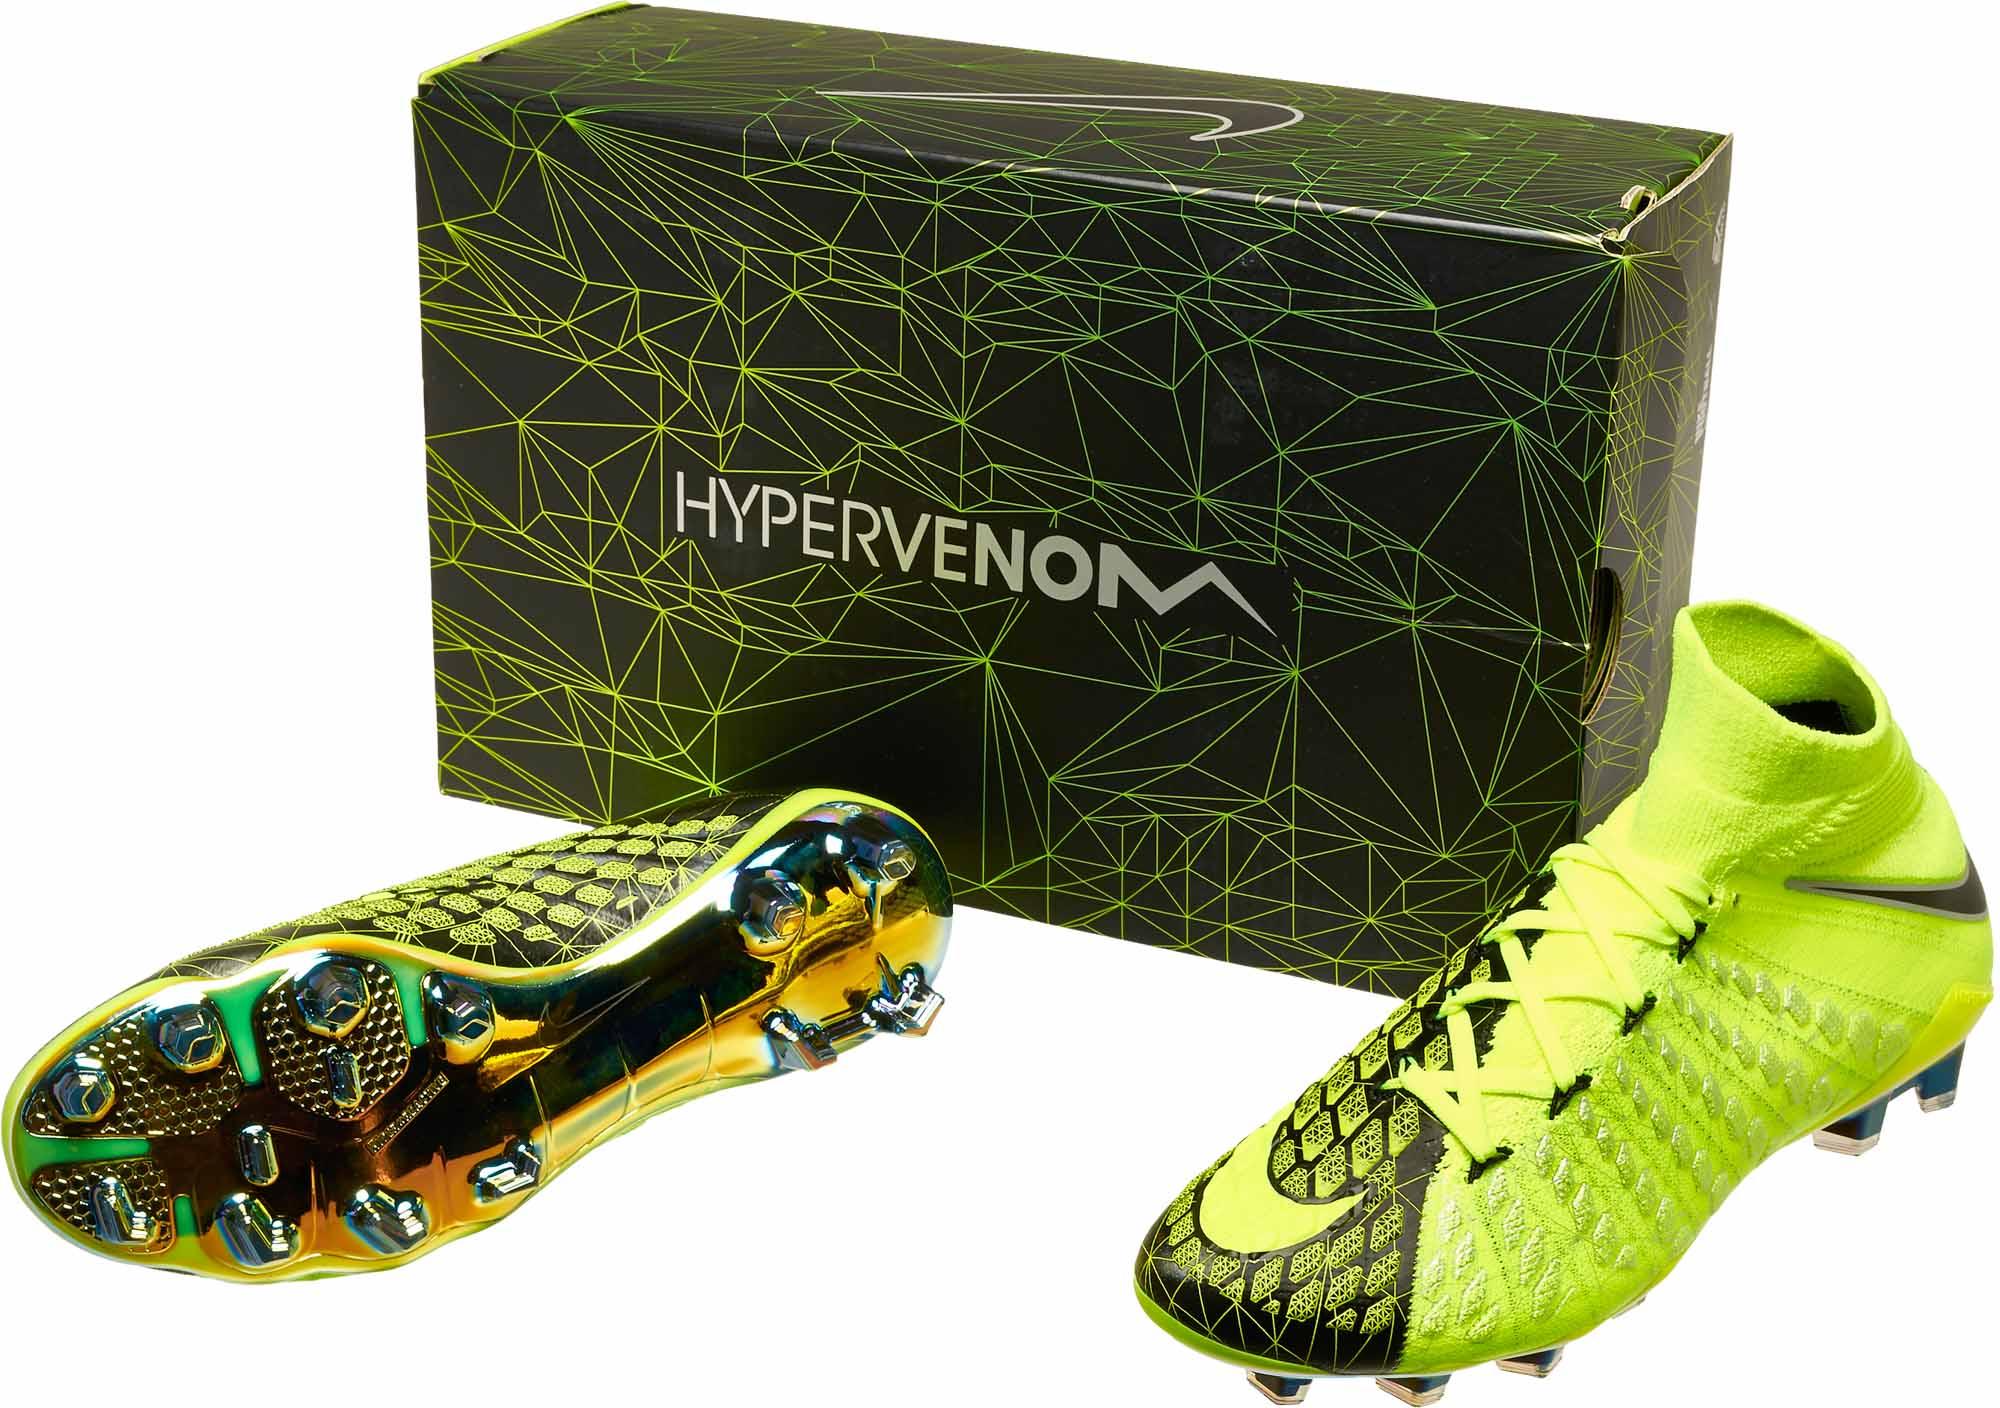 separation shoes 7fdd7 46d1d Nike Hypervenom Phantom III DF FG - EA Sports - Volt & Black ...